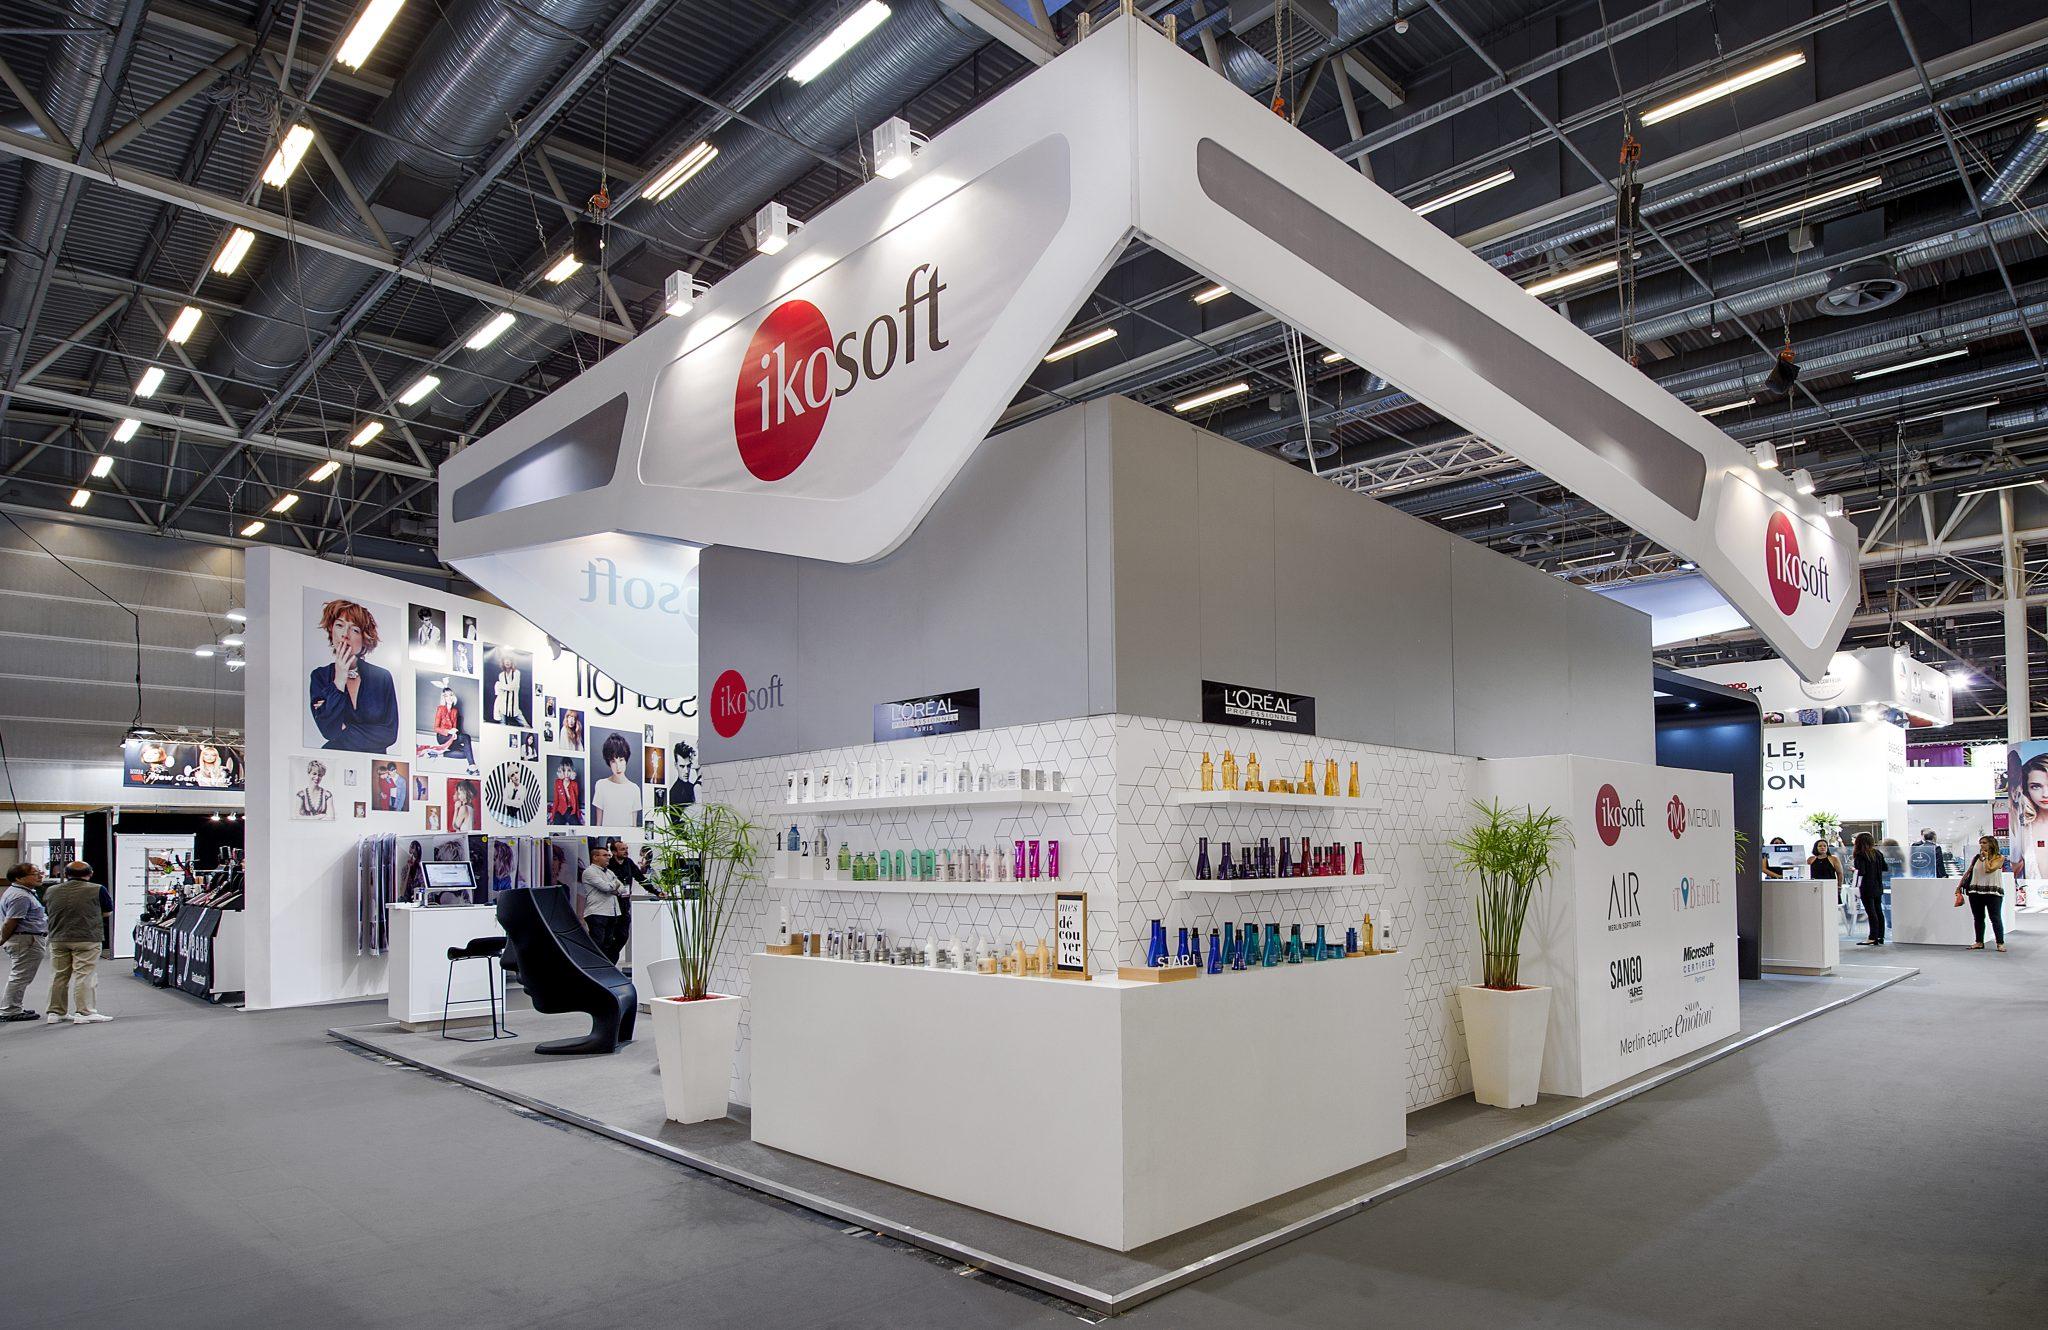 Stand Ikosoft - 108 m² avec Mezzanine 14 m² - Salon MCB 2016 ...